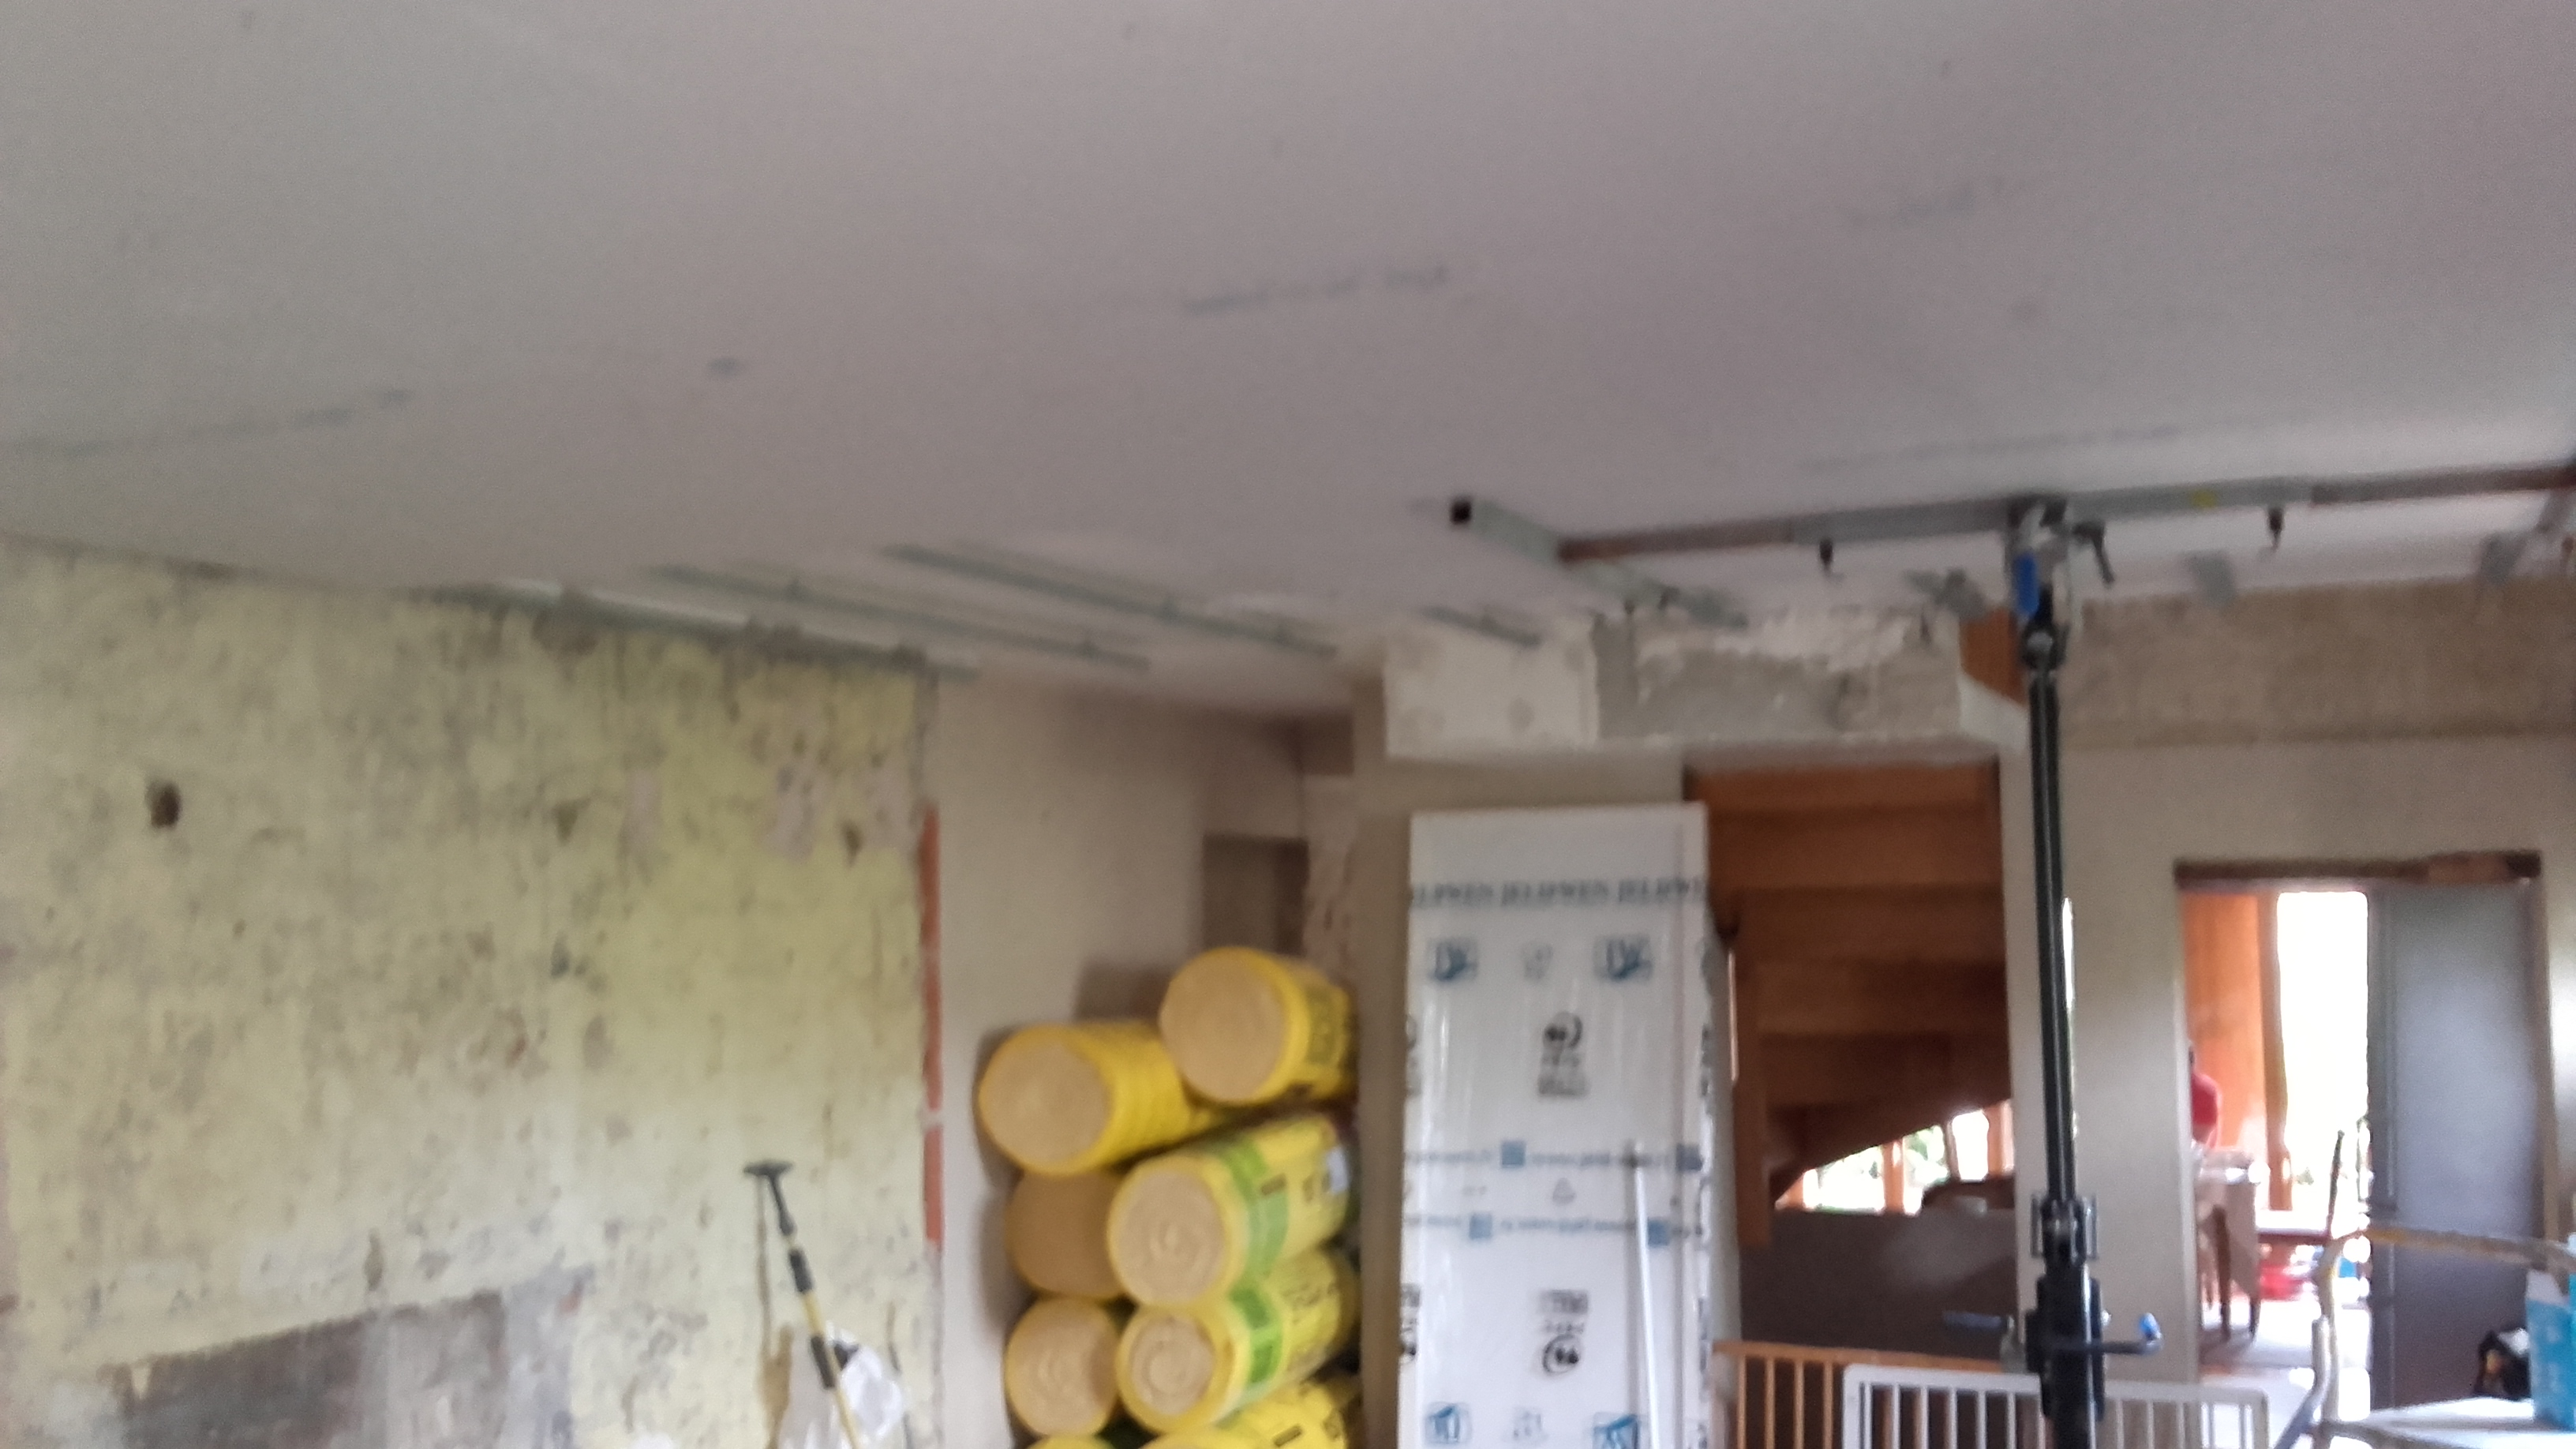 all creations travaux poissy travaux int rieur saint germain en laye renovation 78. Black Bedroom Furniture Sets. Home Design Ideas